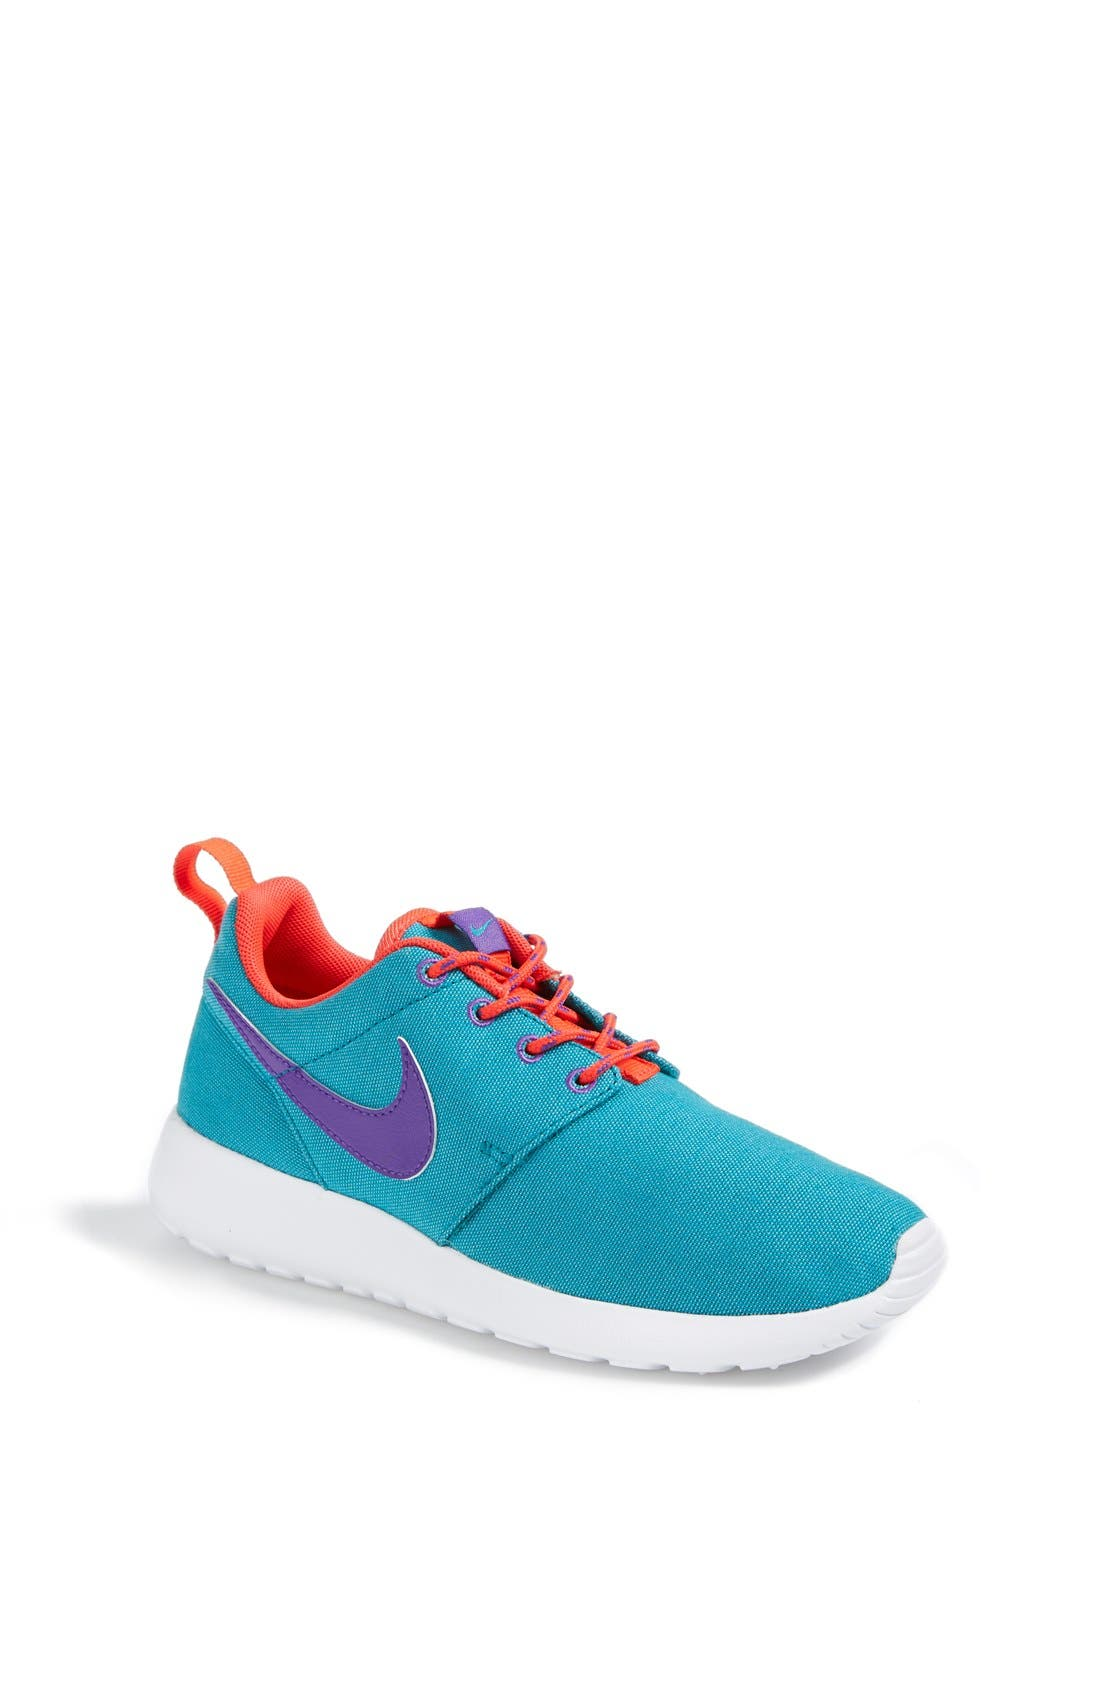 'Roshe Run' Athletic Shoe,                             Main thumbnail 28, color,